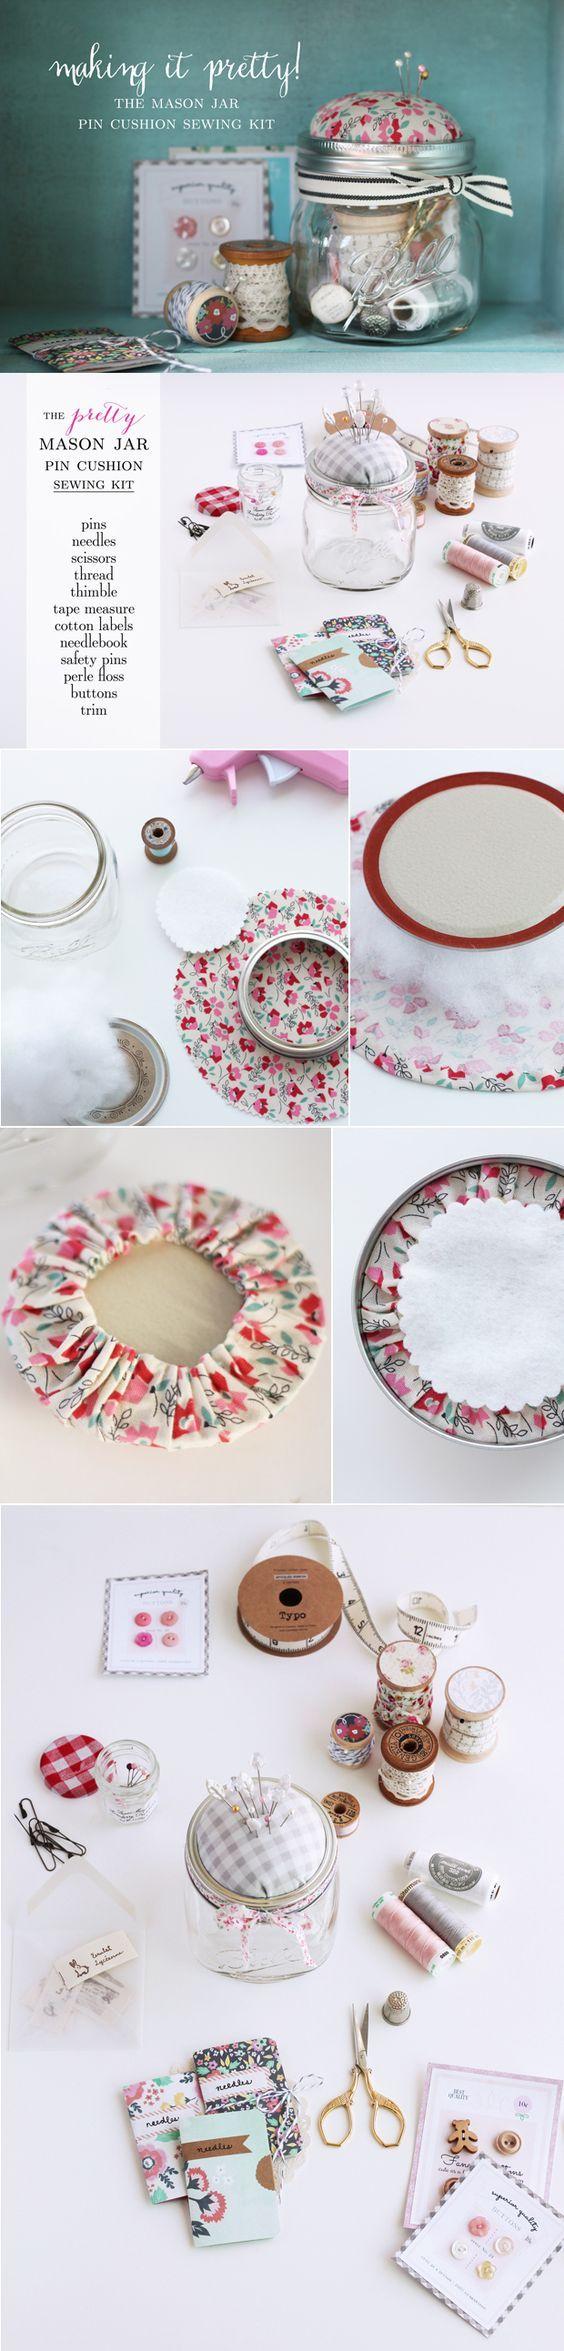 The Mason Jar Pin Cushion Stitching Equipment. #Crafts #diy: